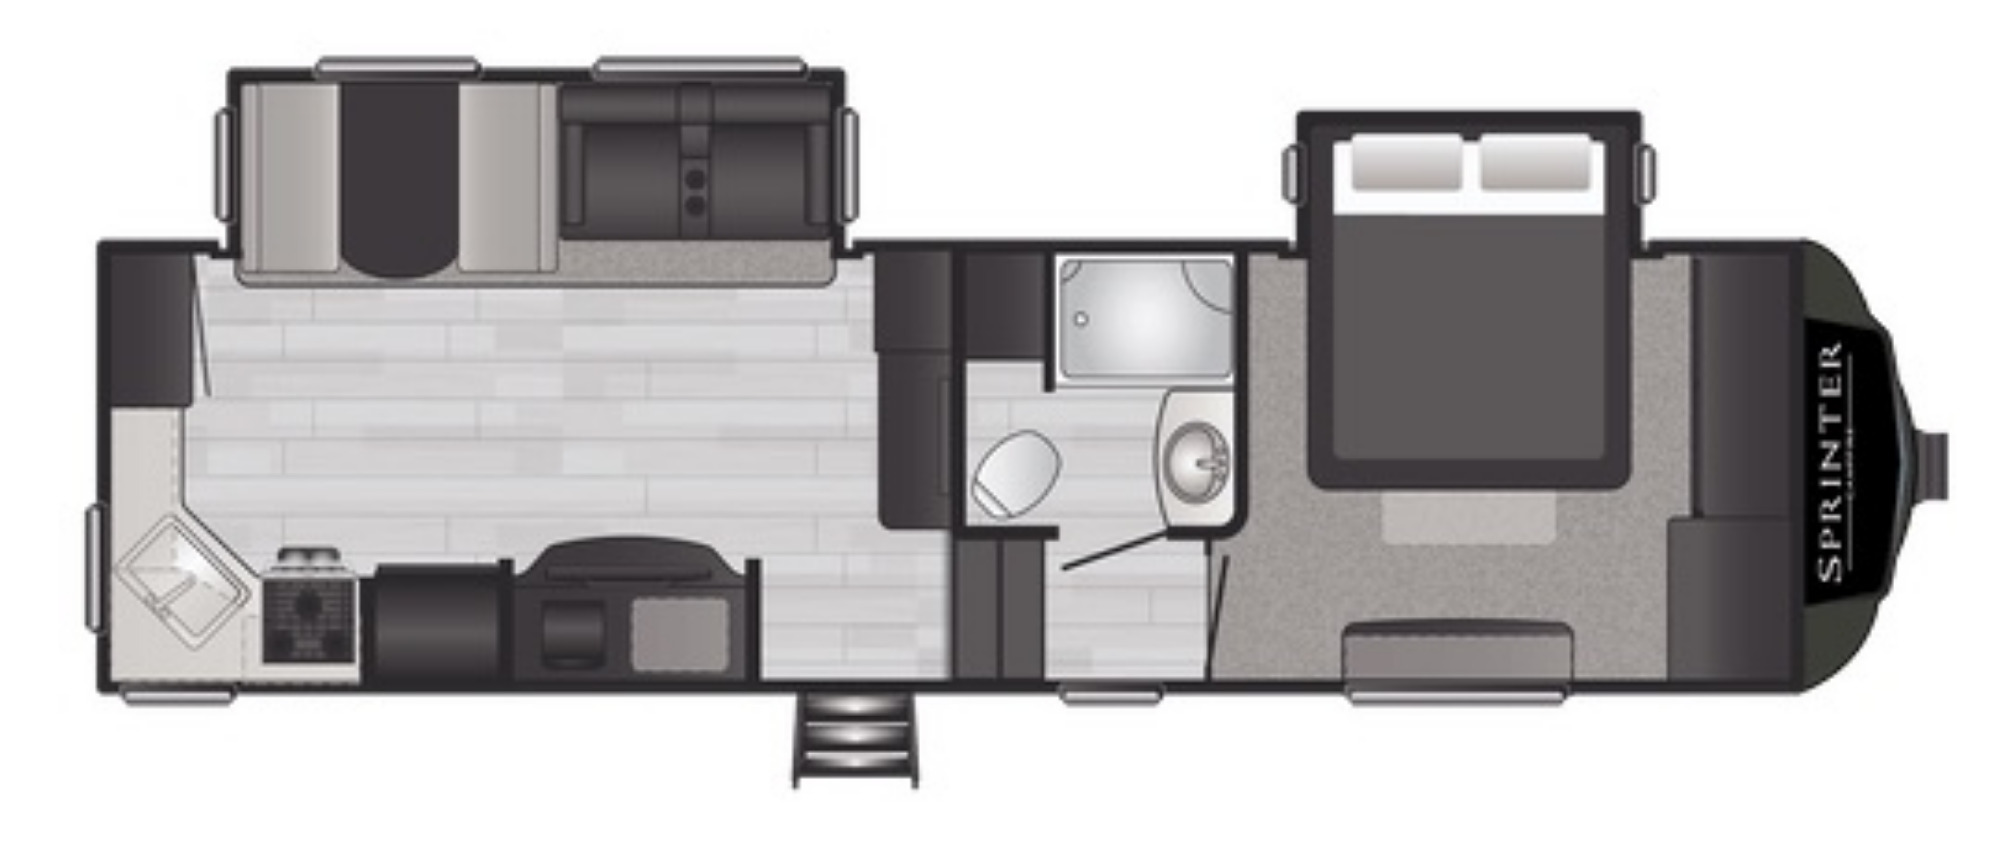 View Floor Plan for 2021 KEYSTONE SPRINTER 27ML